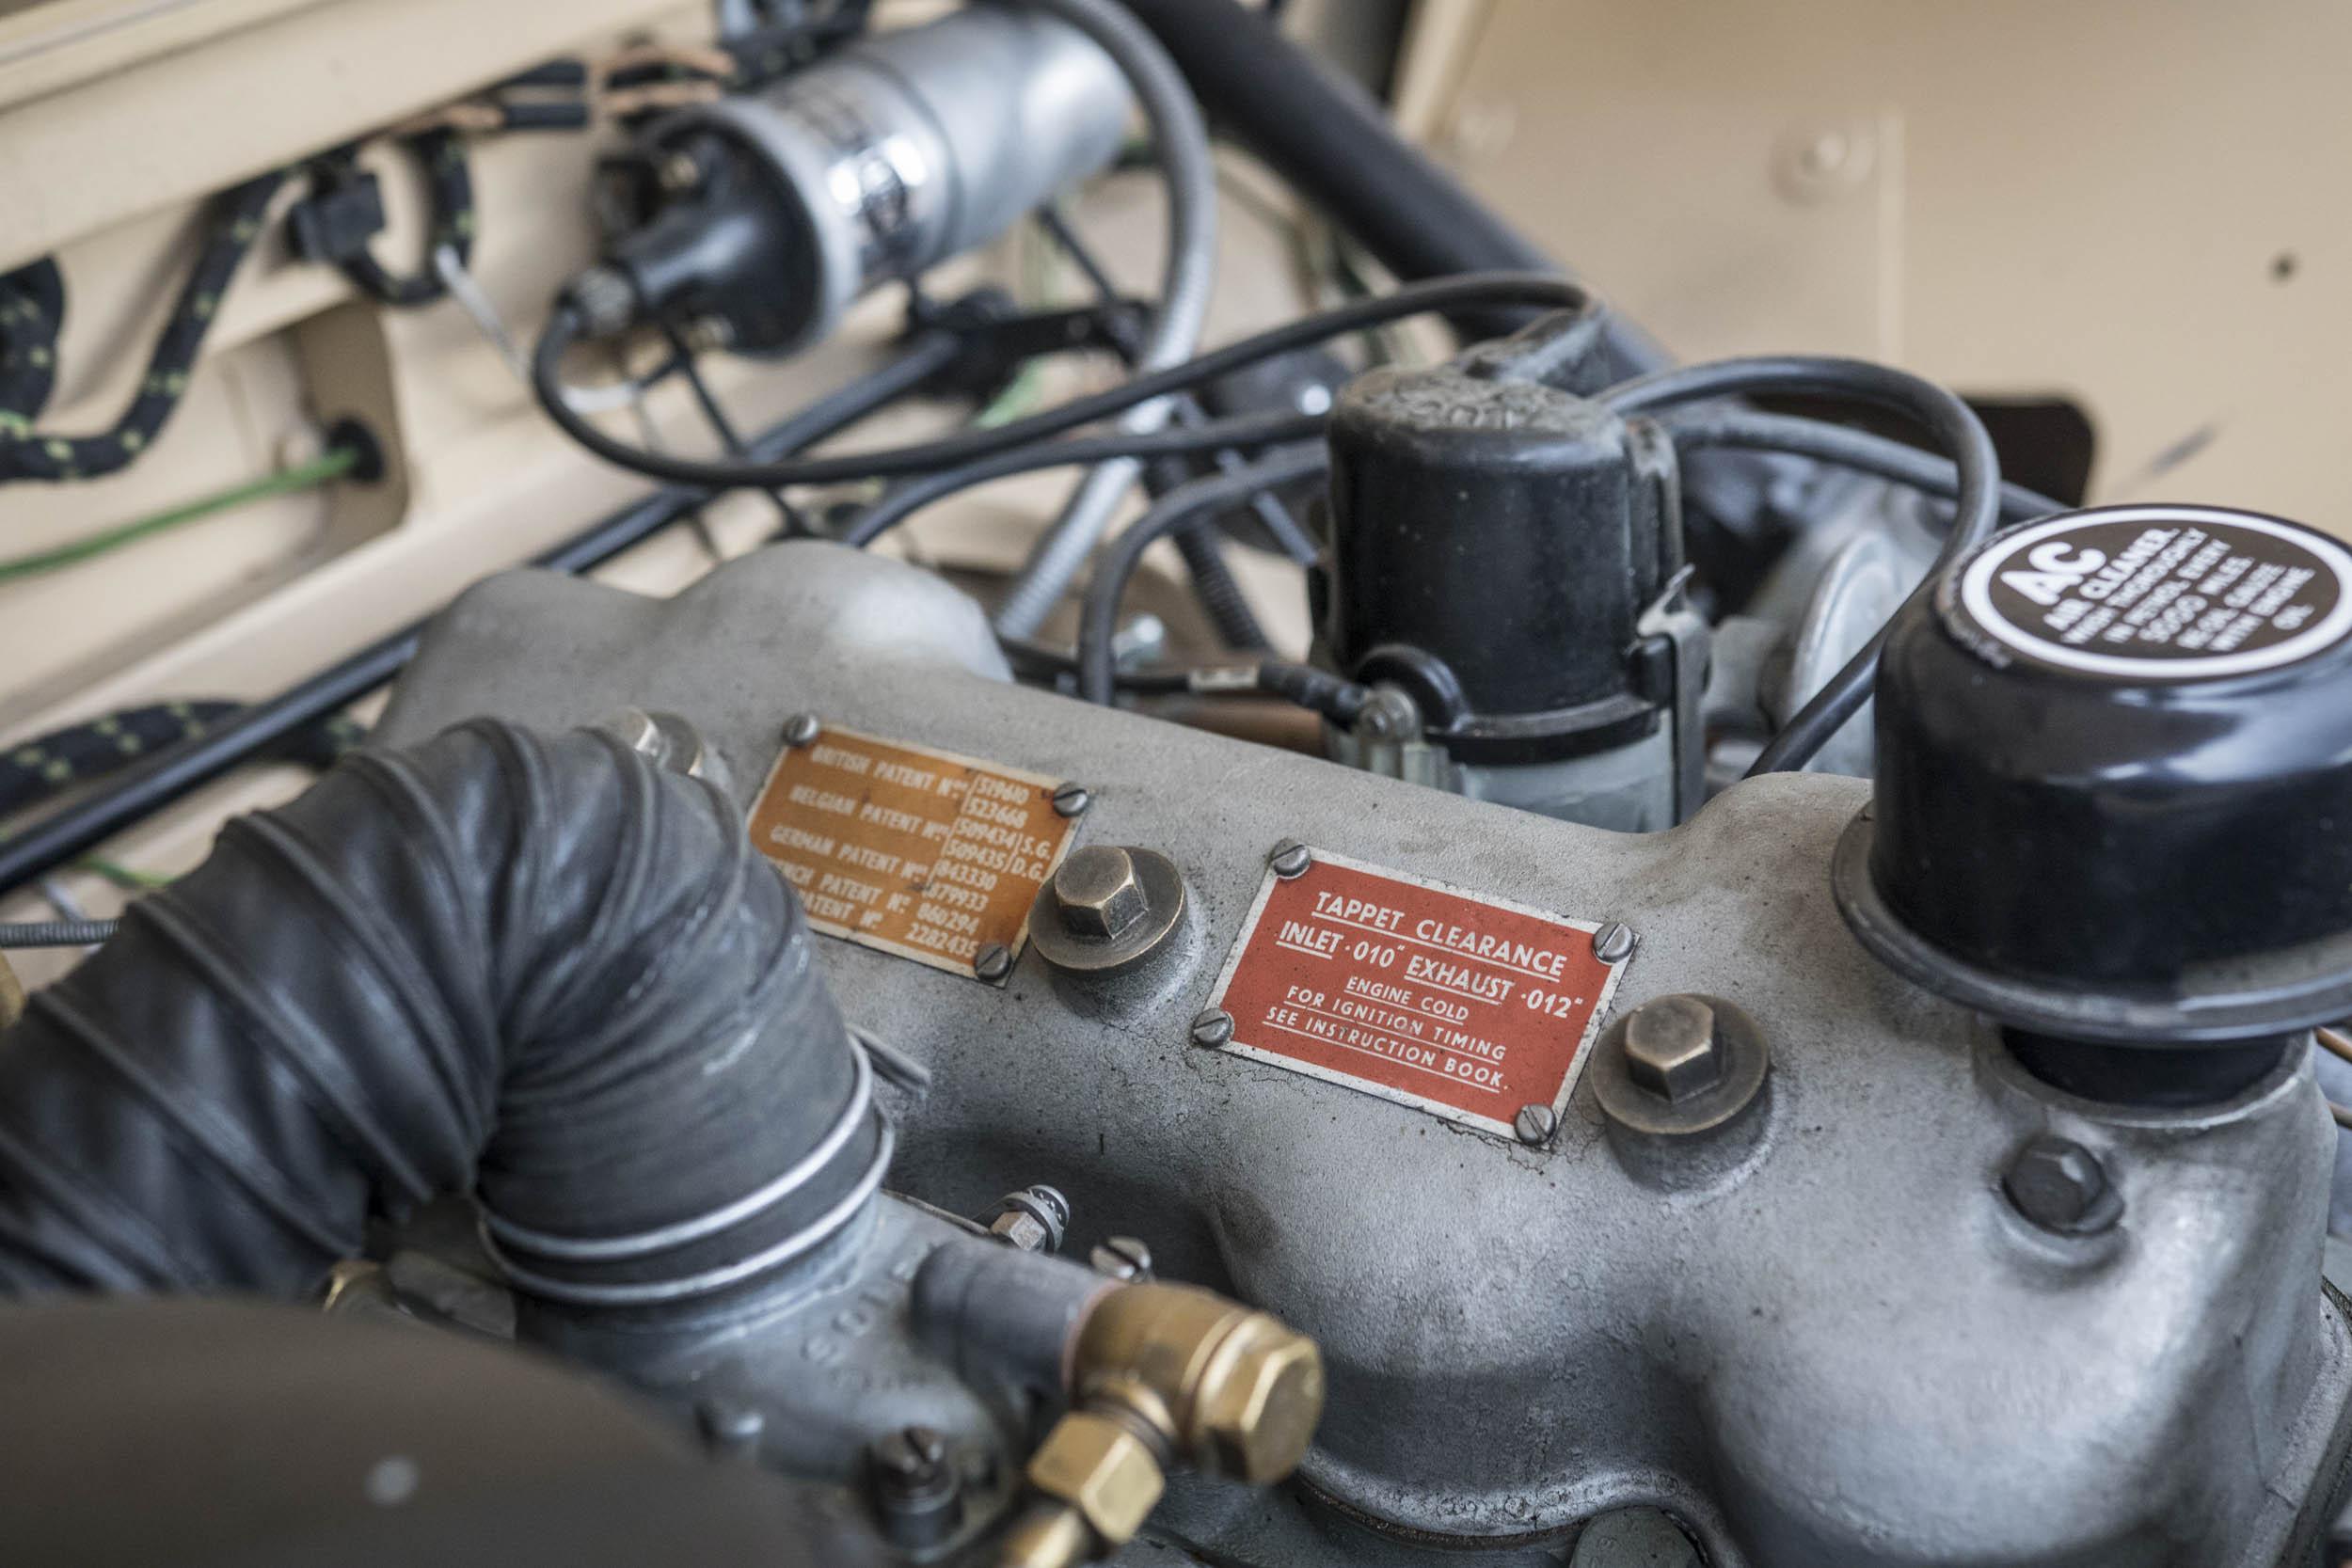 1957 Land Rover engine